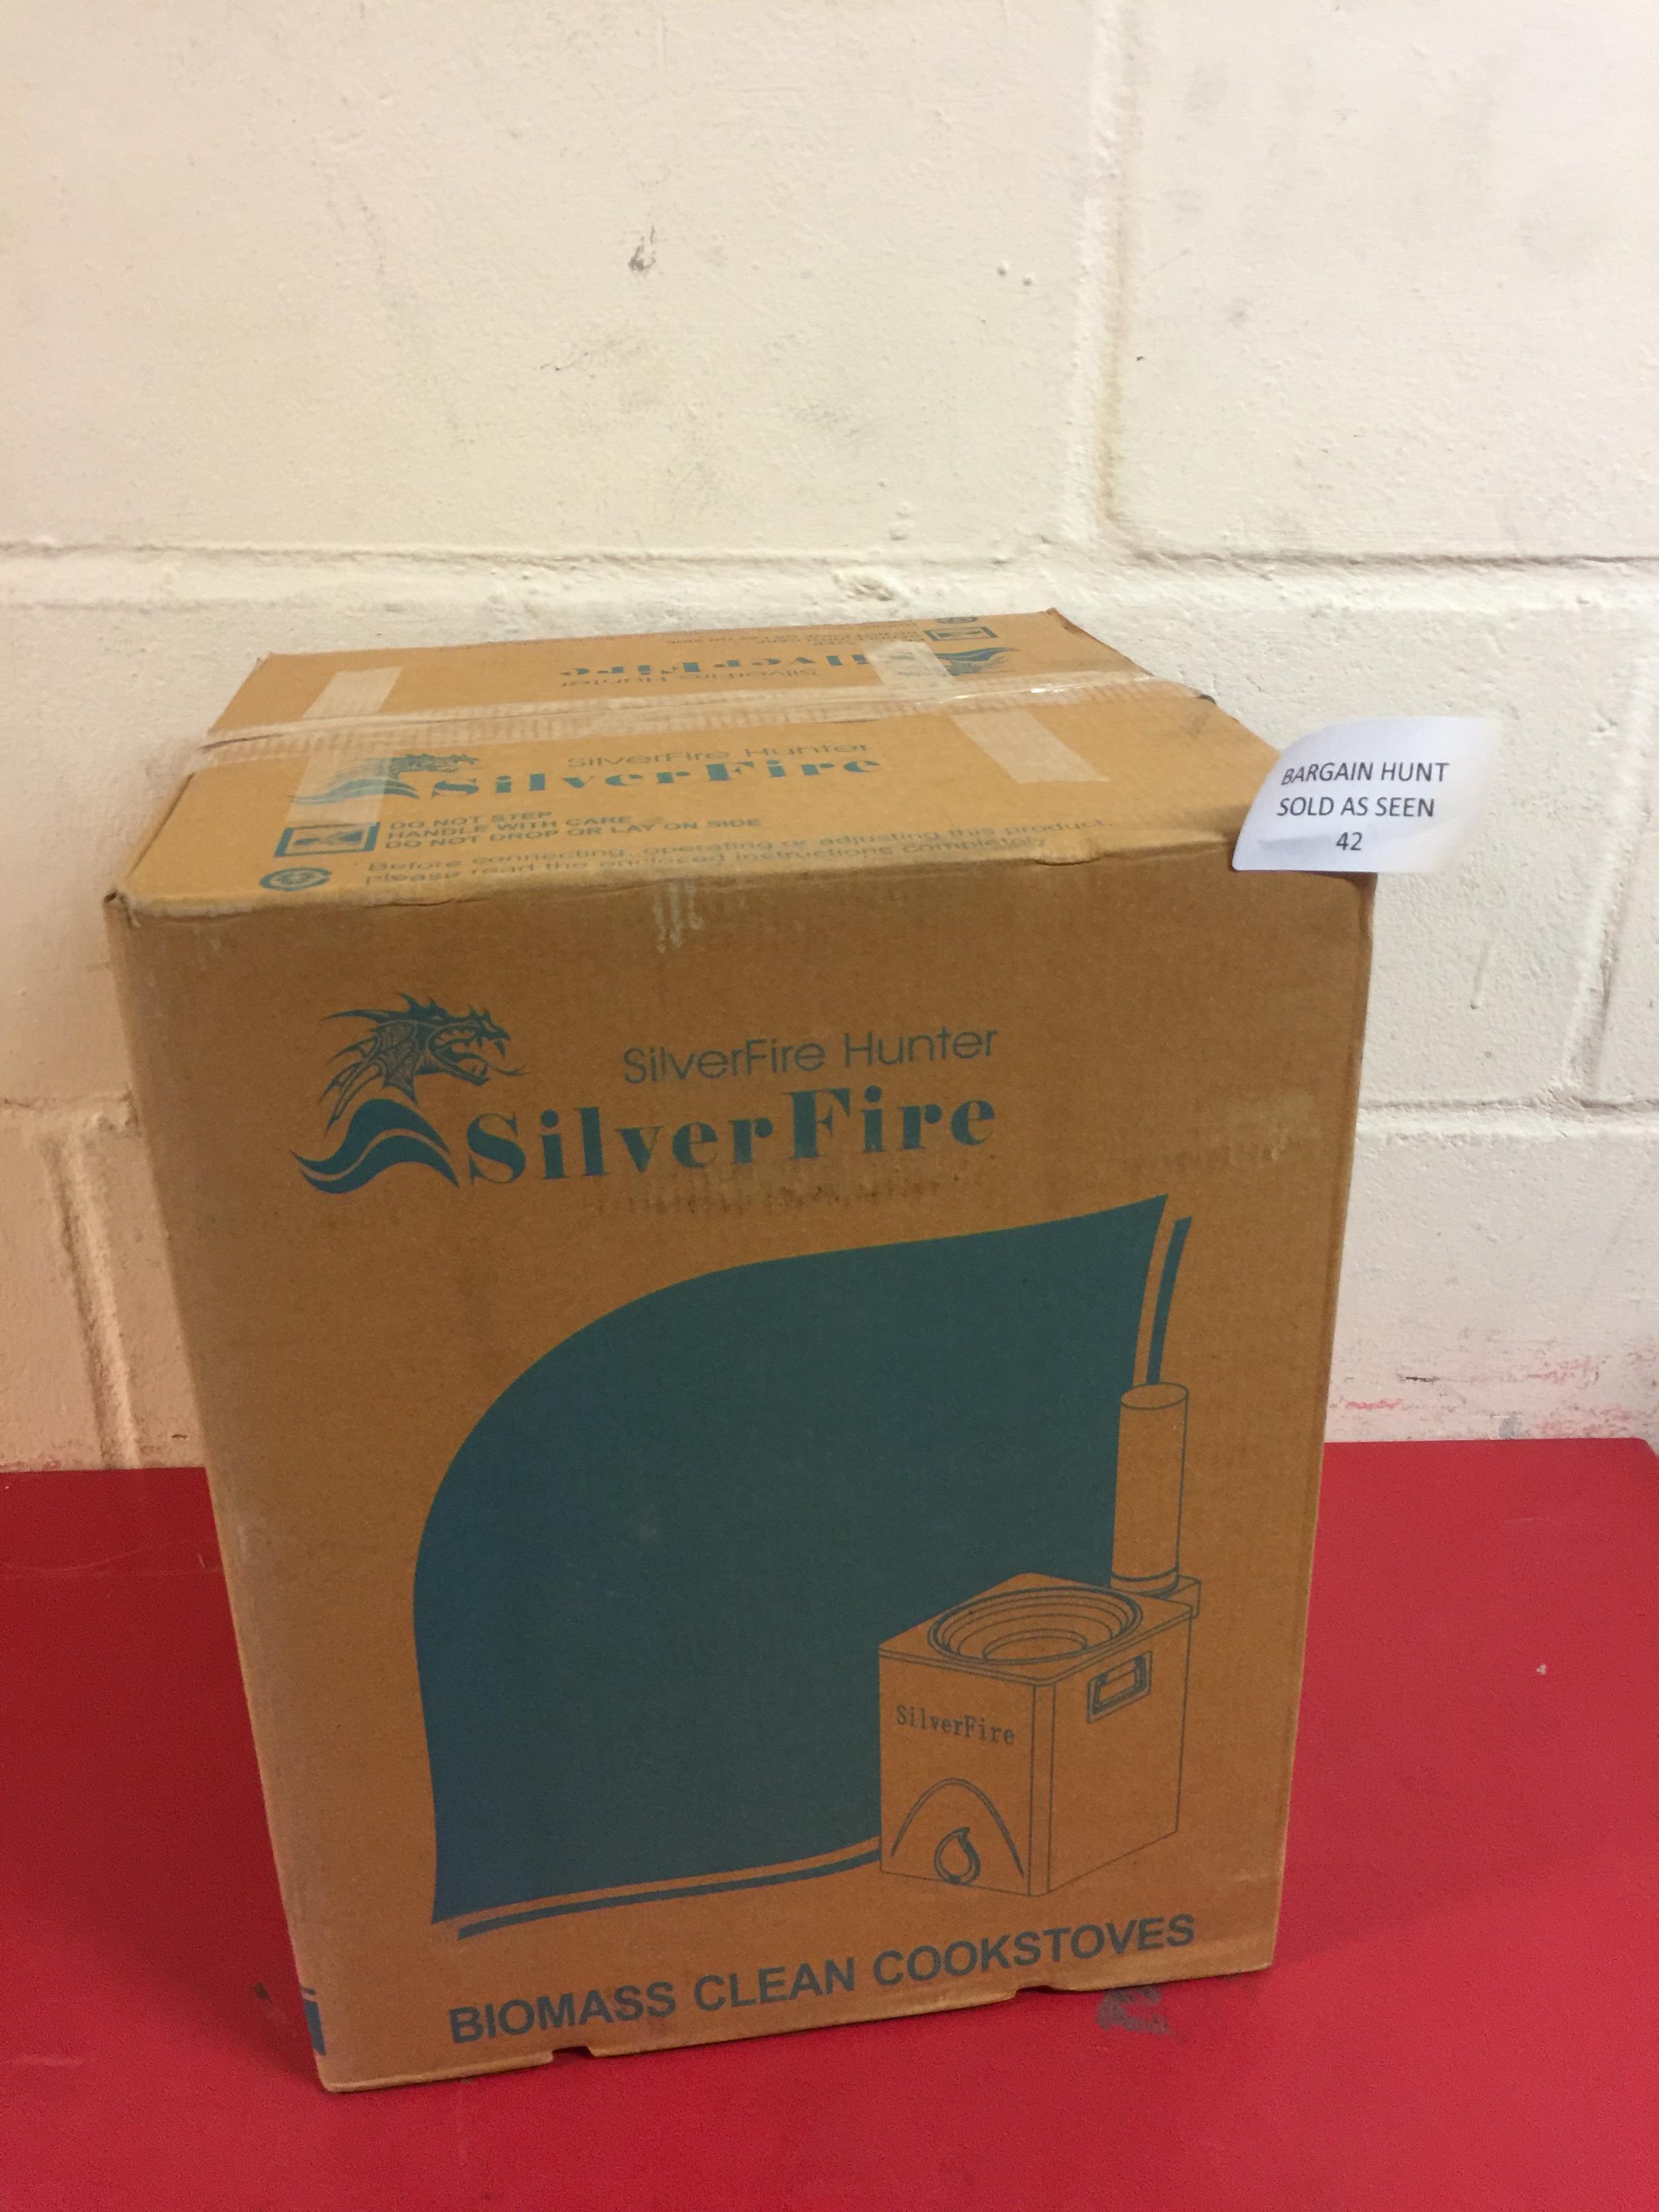 Lot 42 - SilverFire Hunter Chimney Stove RRP £135